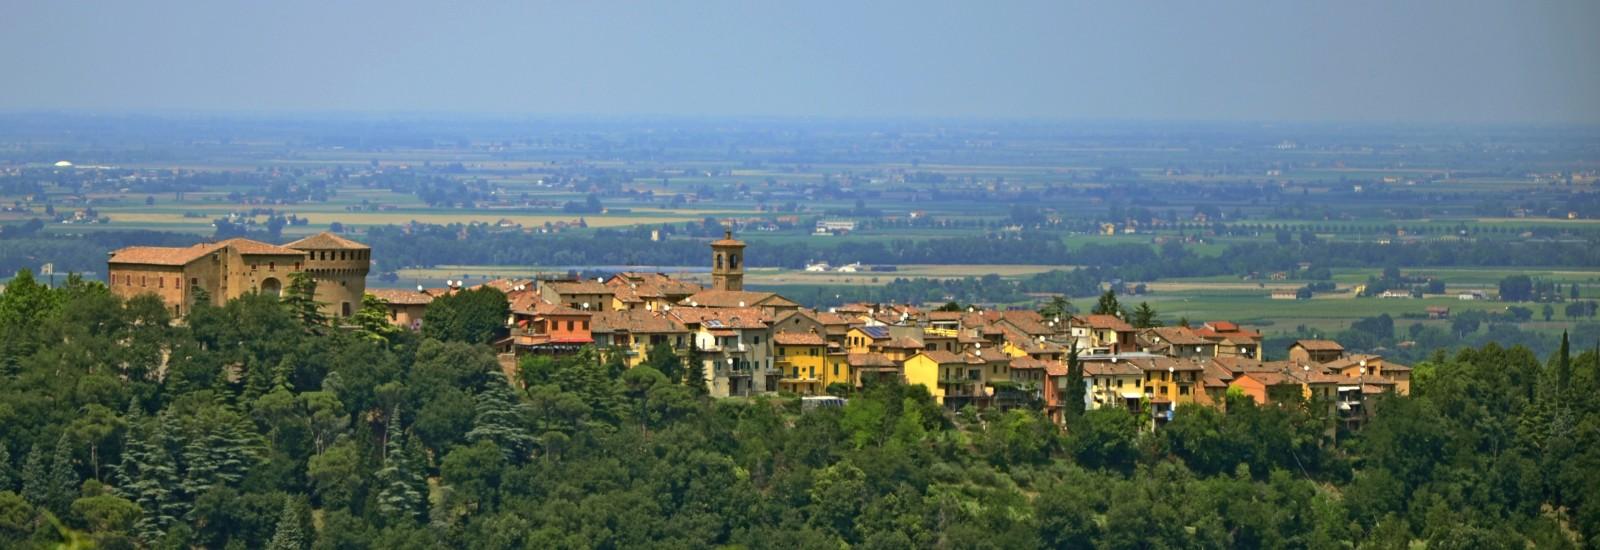 Castelli e Terme intorno a Bologna